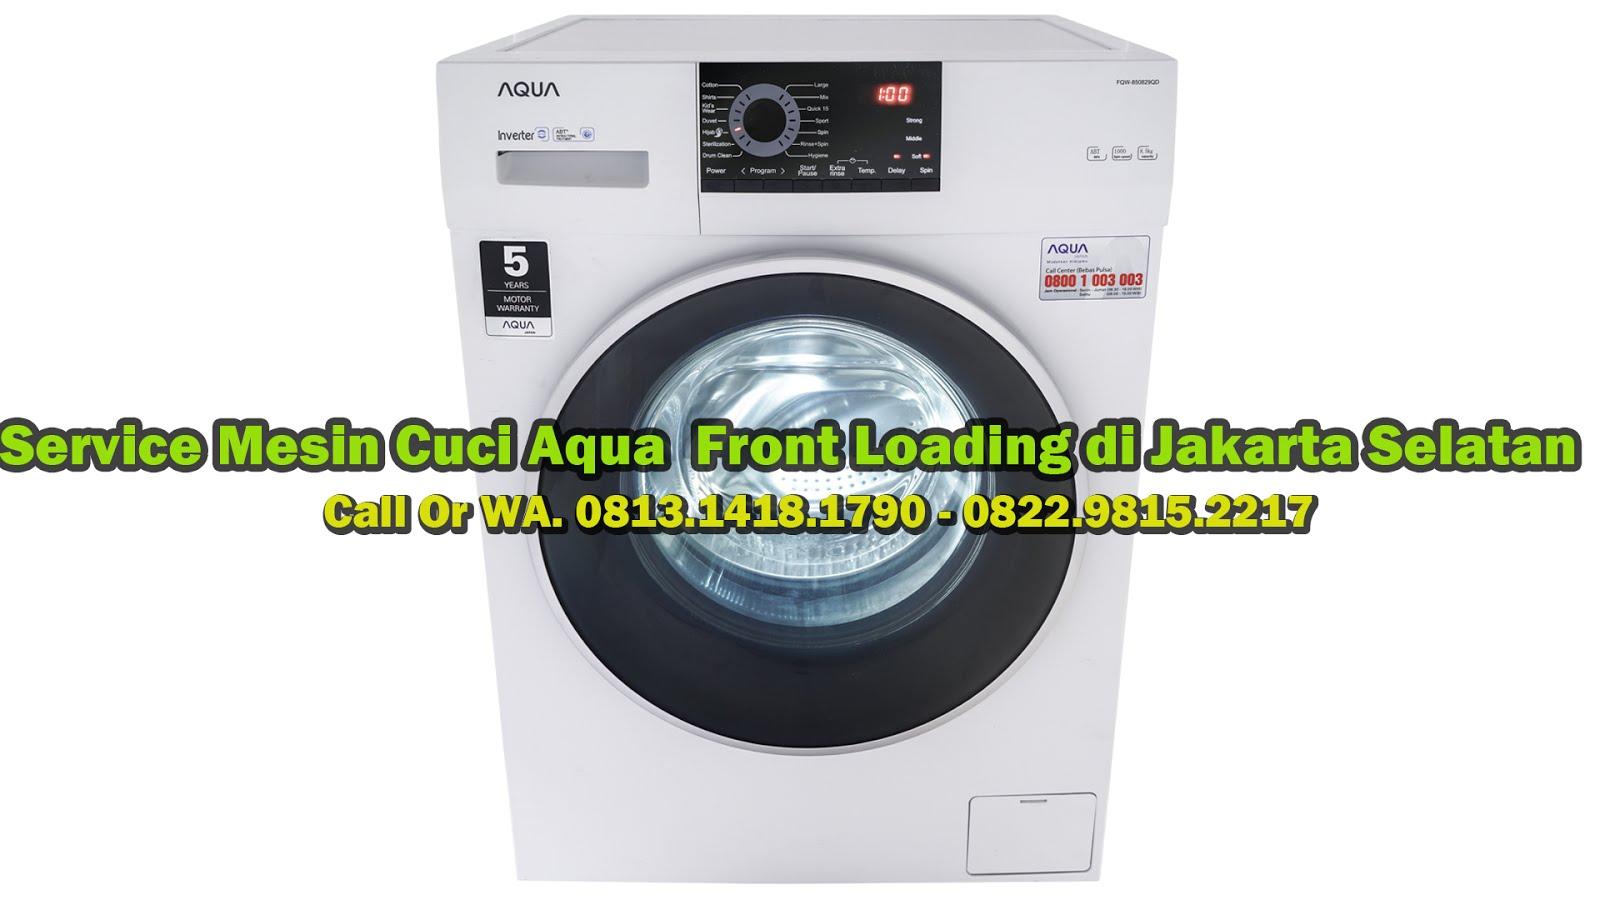 Service Mesic Cuci Aqua Front Loading di Jakarta Selatan